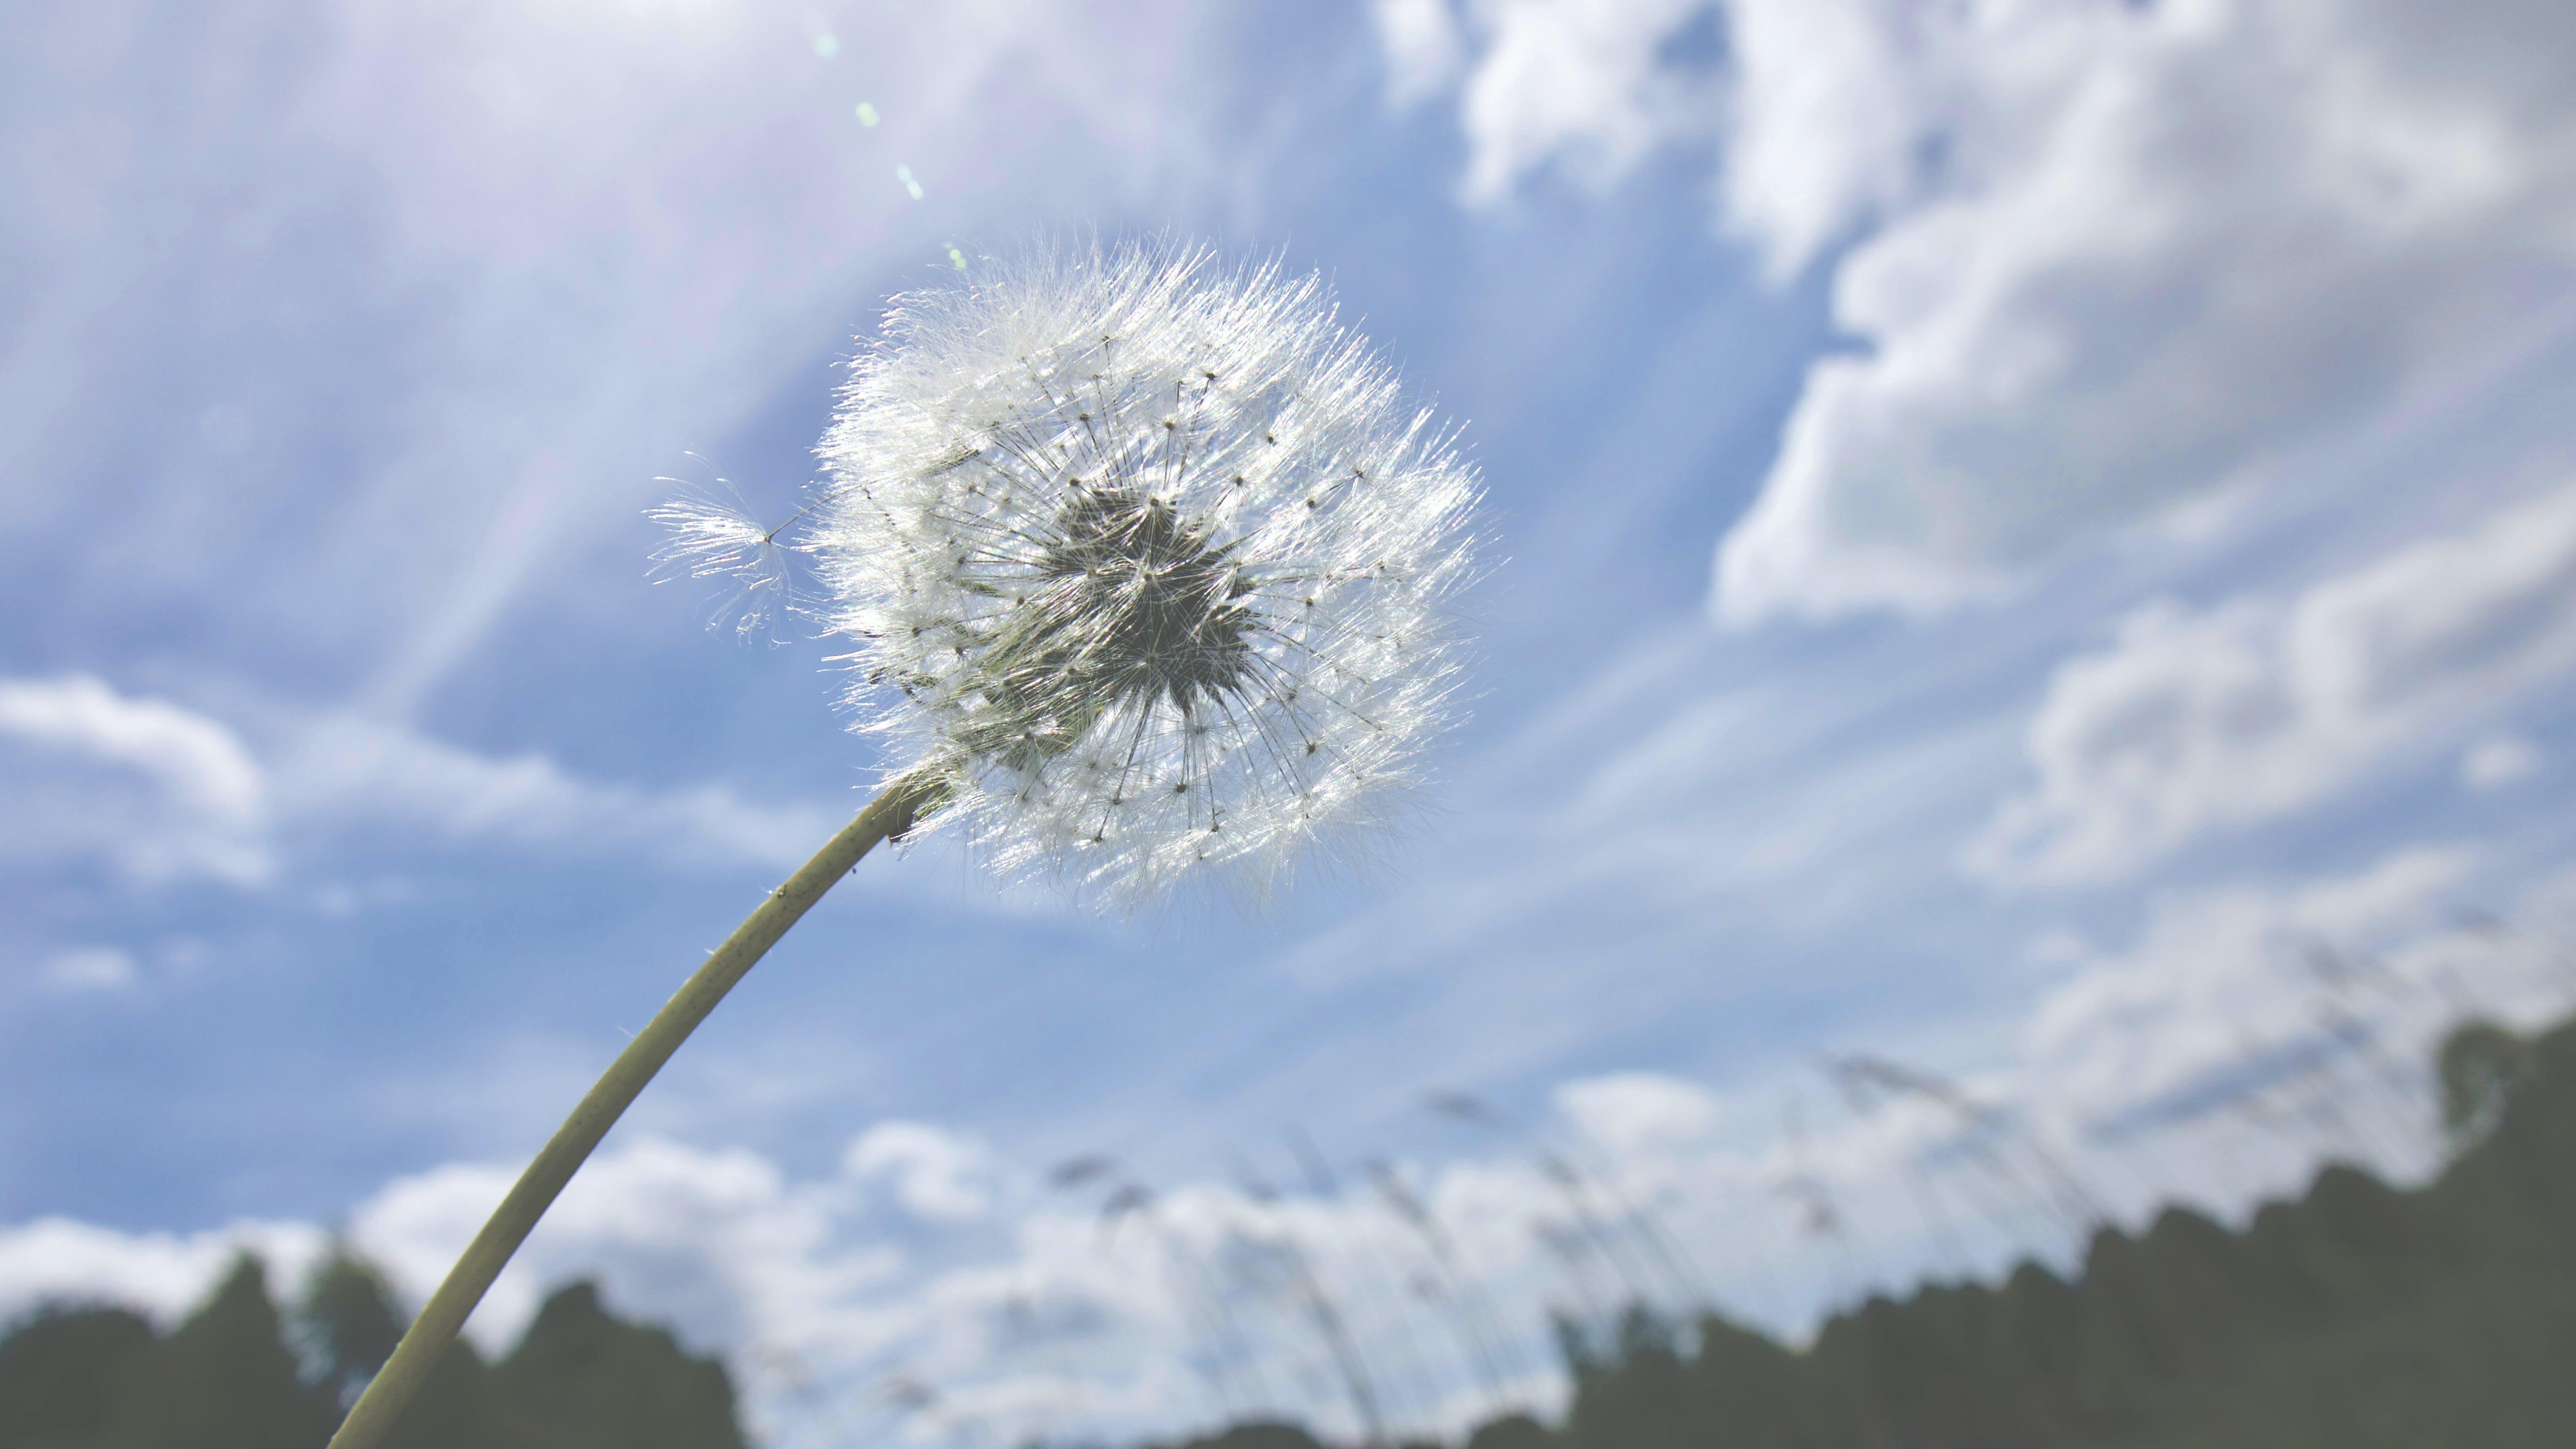 Dandelion Selective-focus Photography